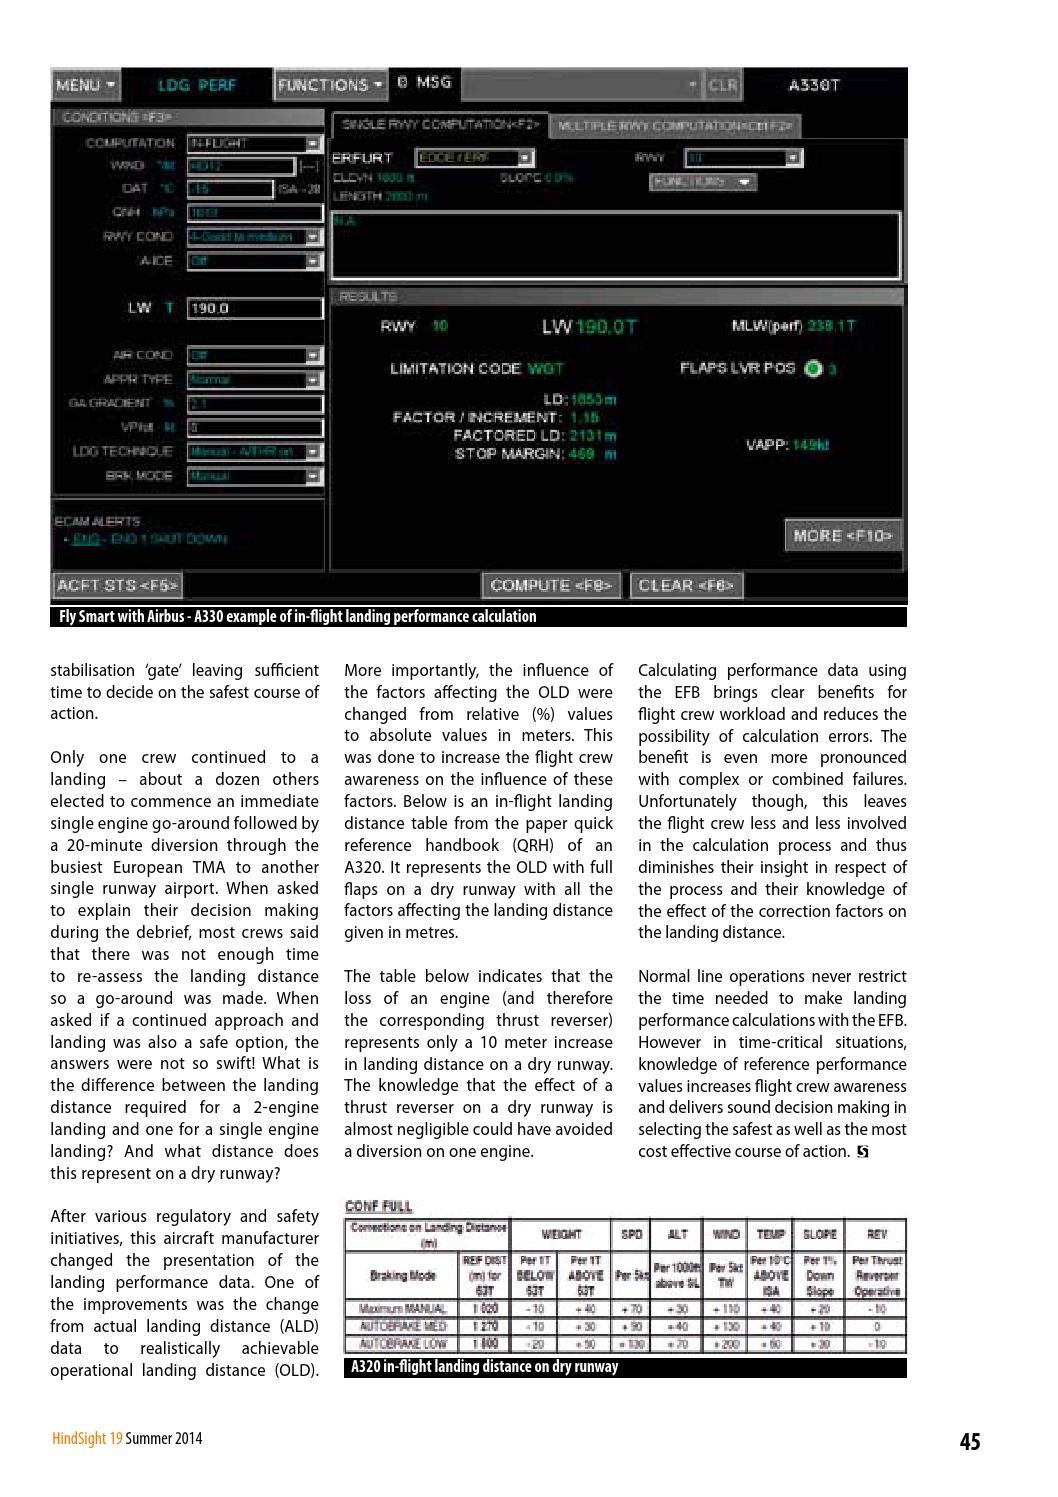 Hindsight 19 by EUROCONTROL - issuu